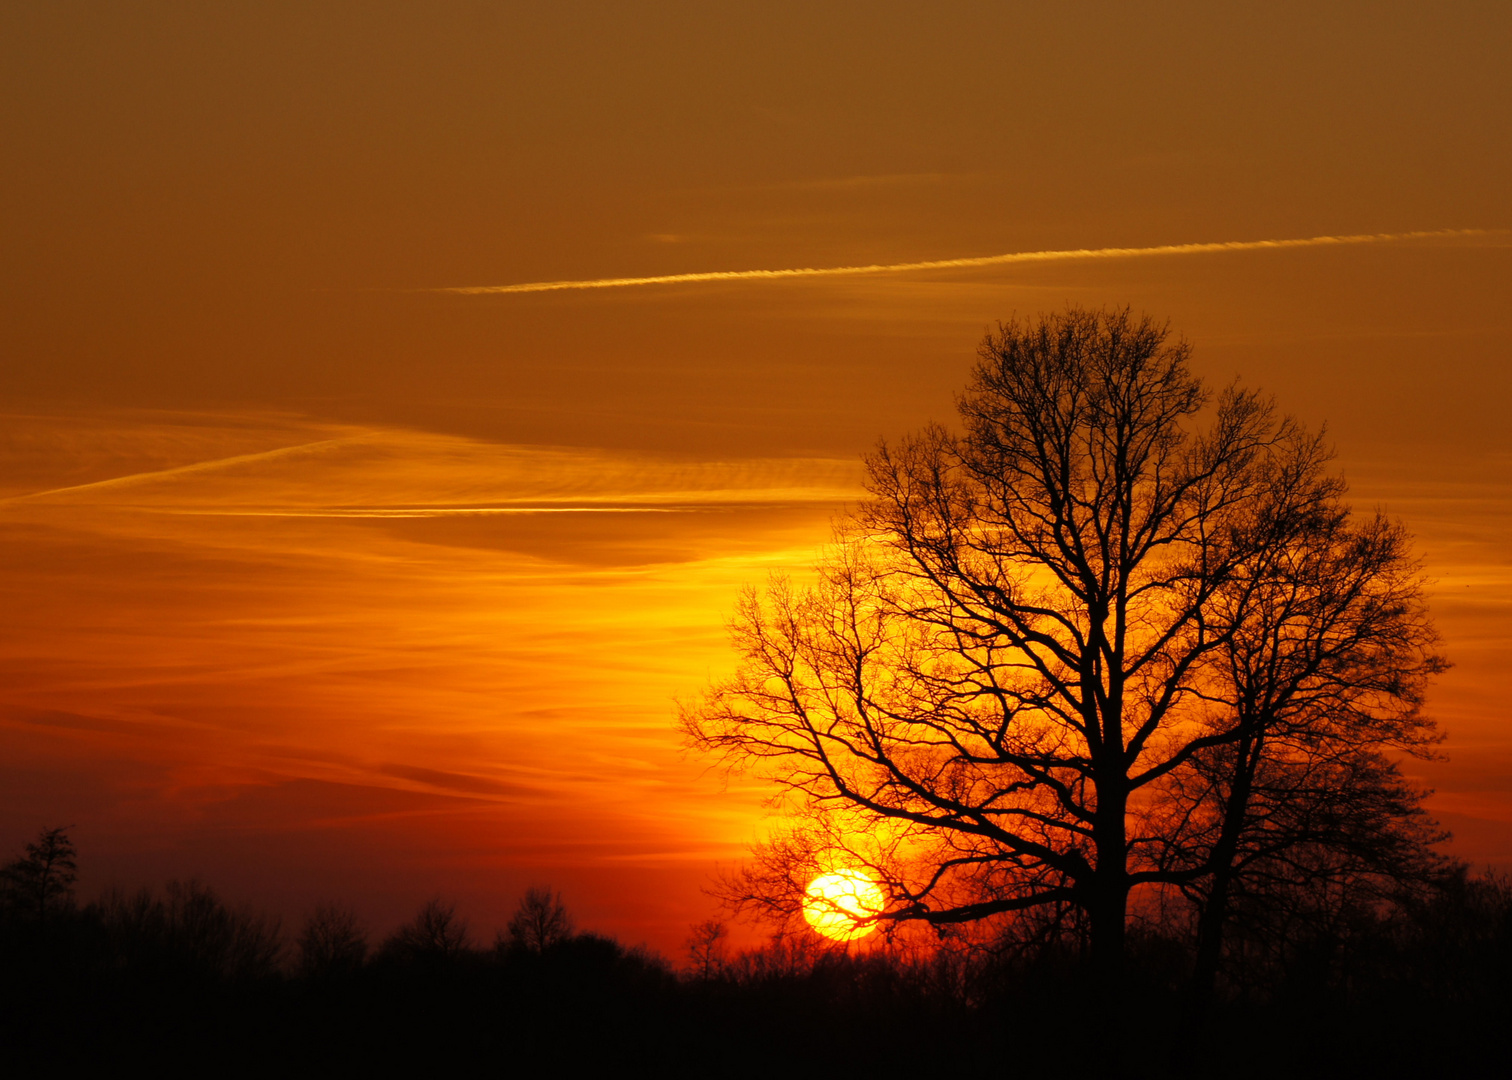 Sonnenuntergang im Emsland (März 2011)